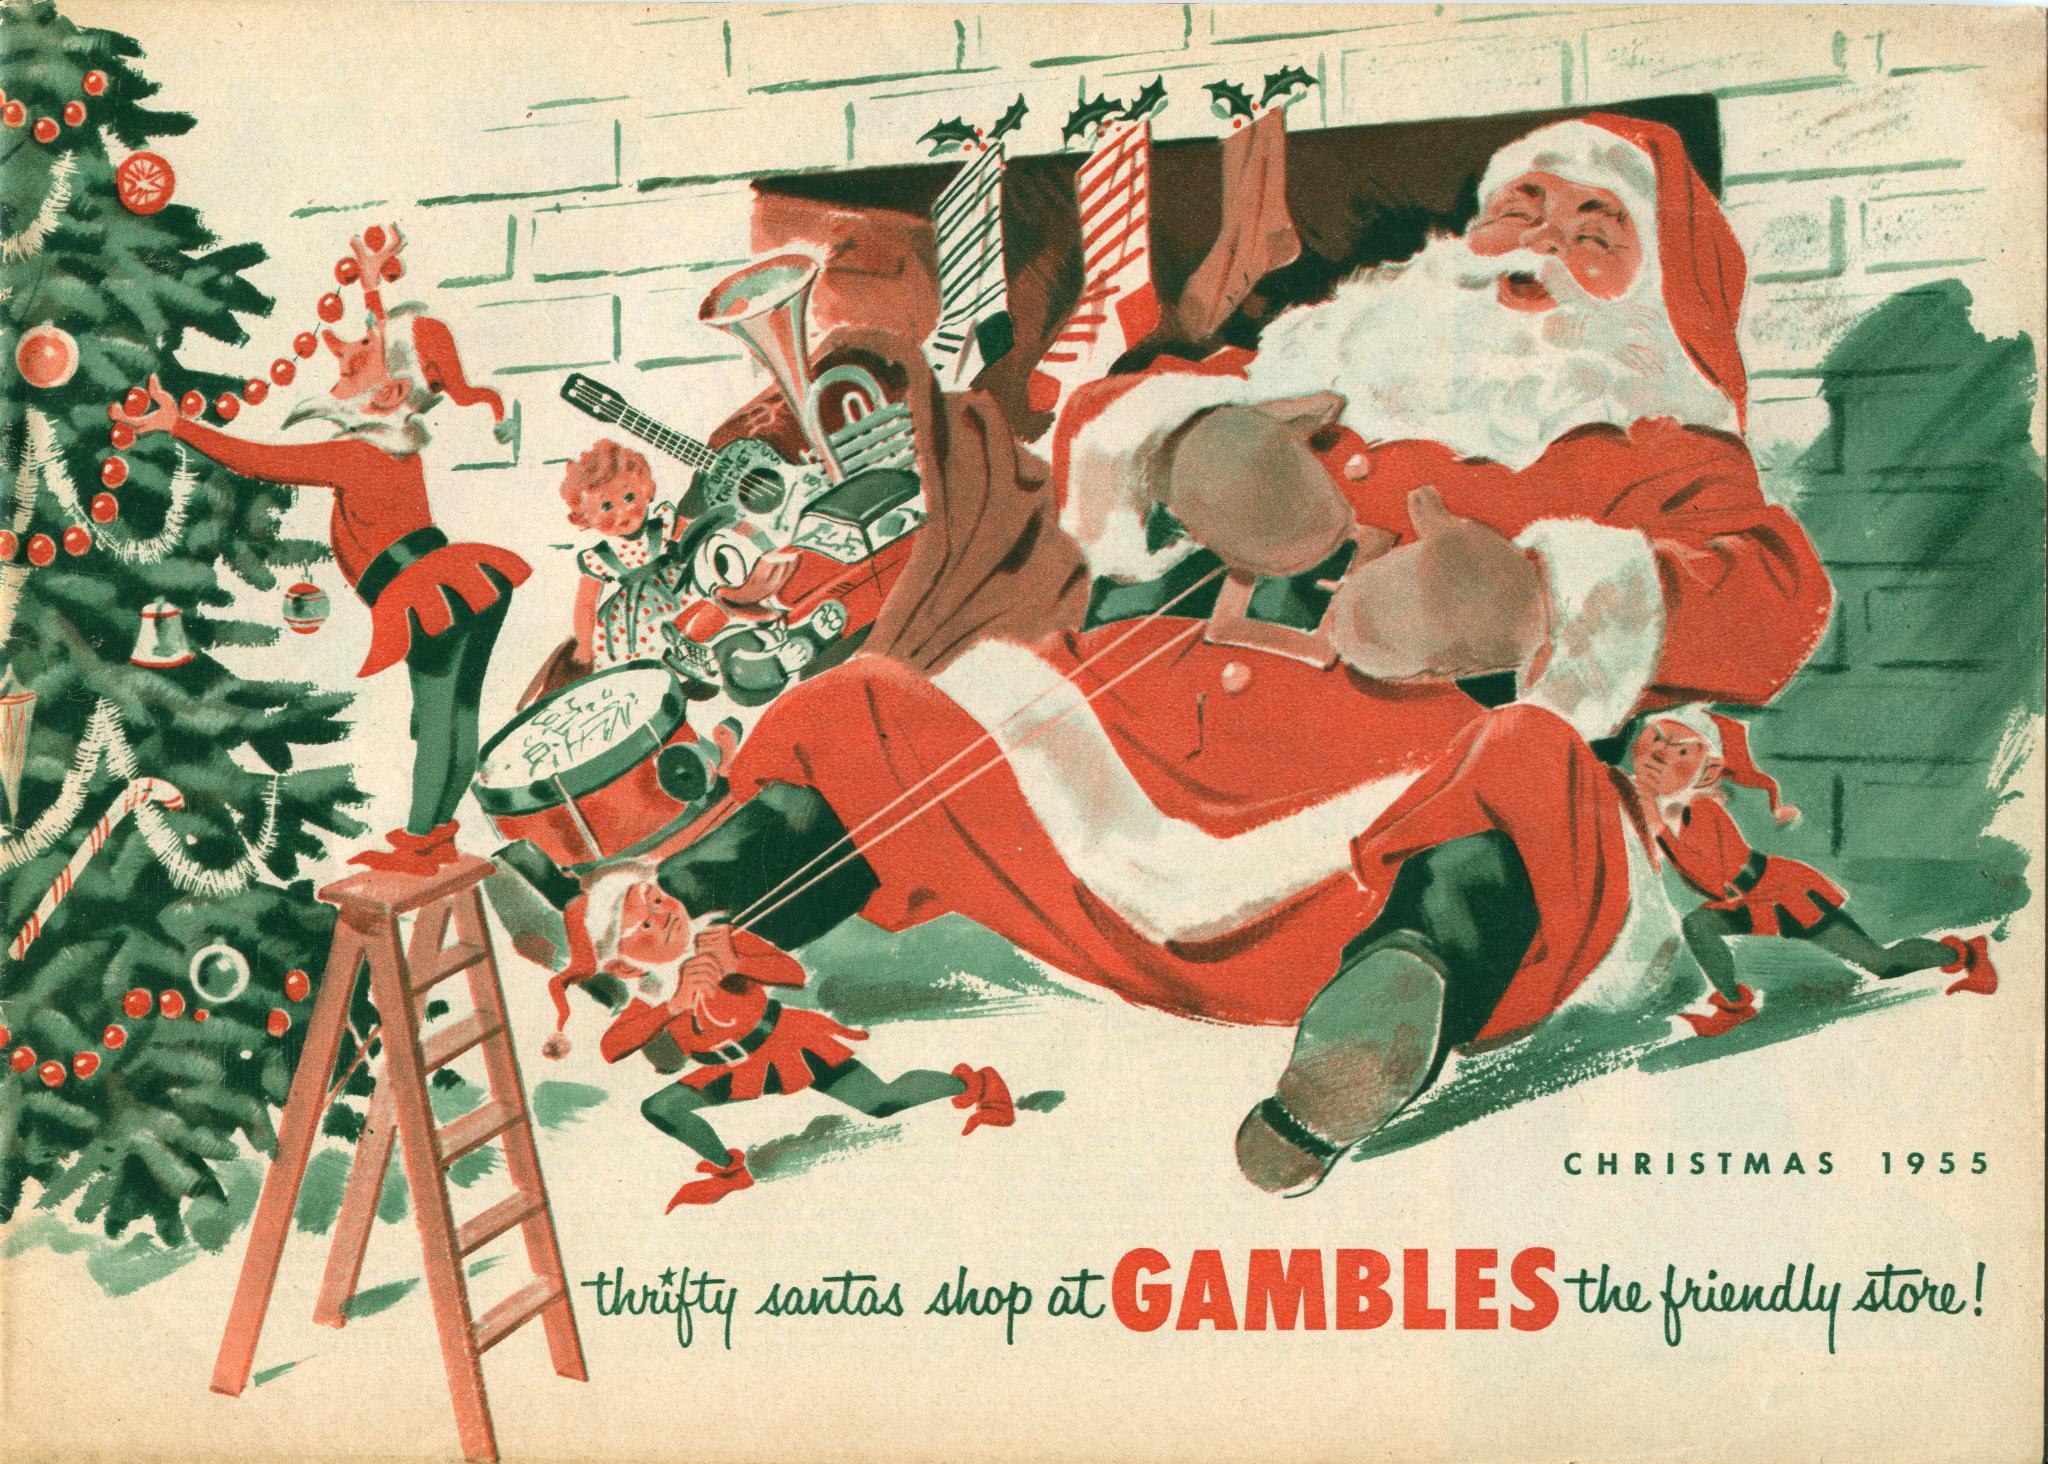 Gambles Christmas 1955 catalog